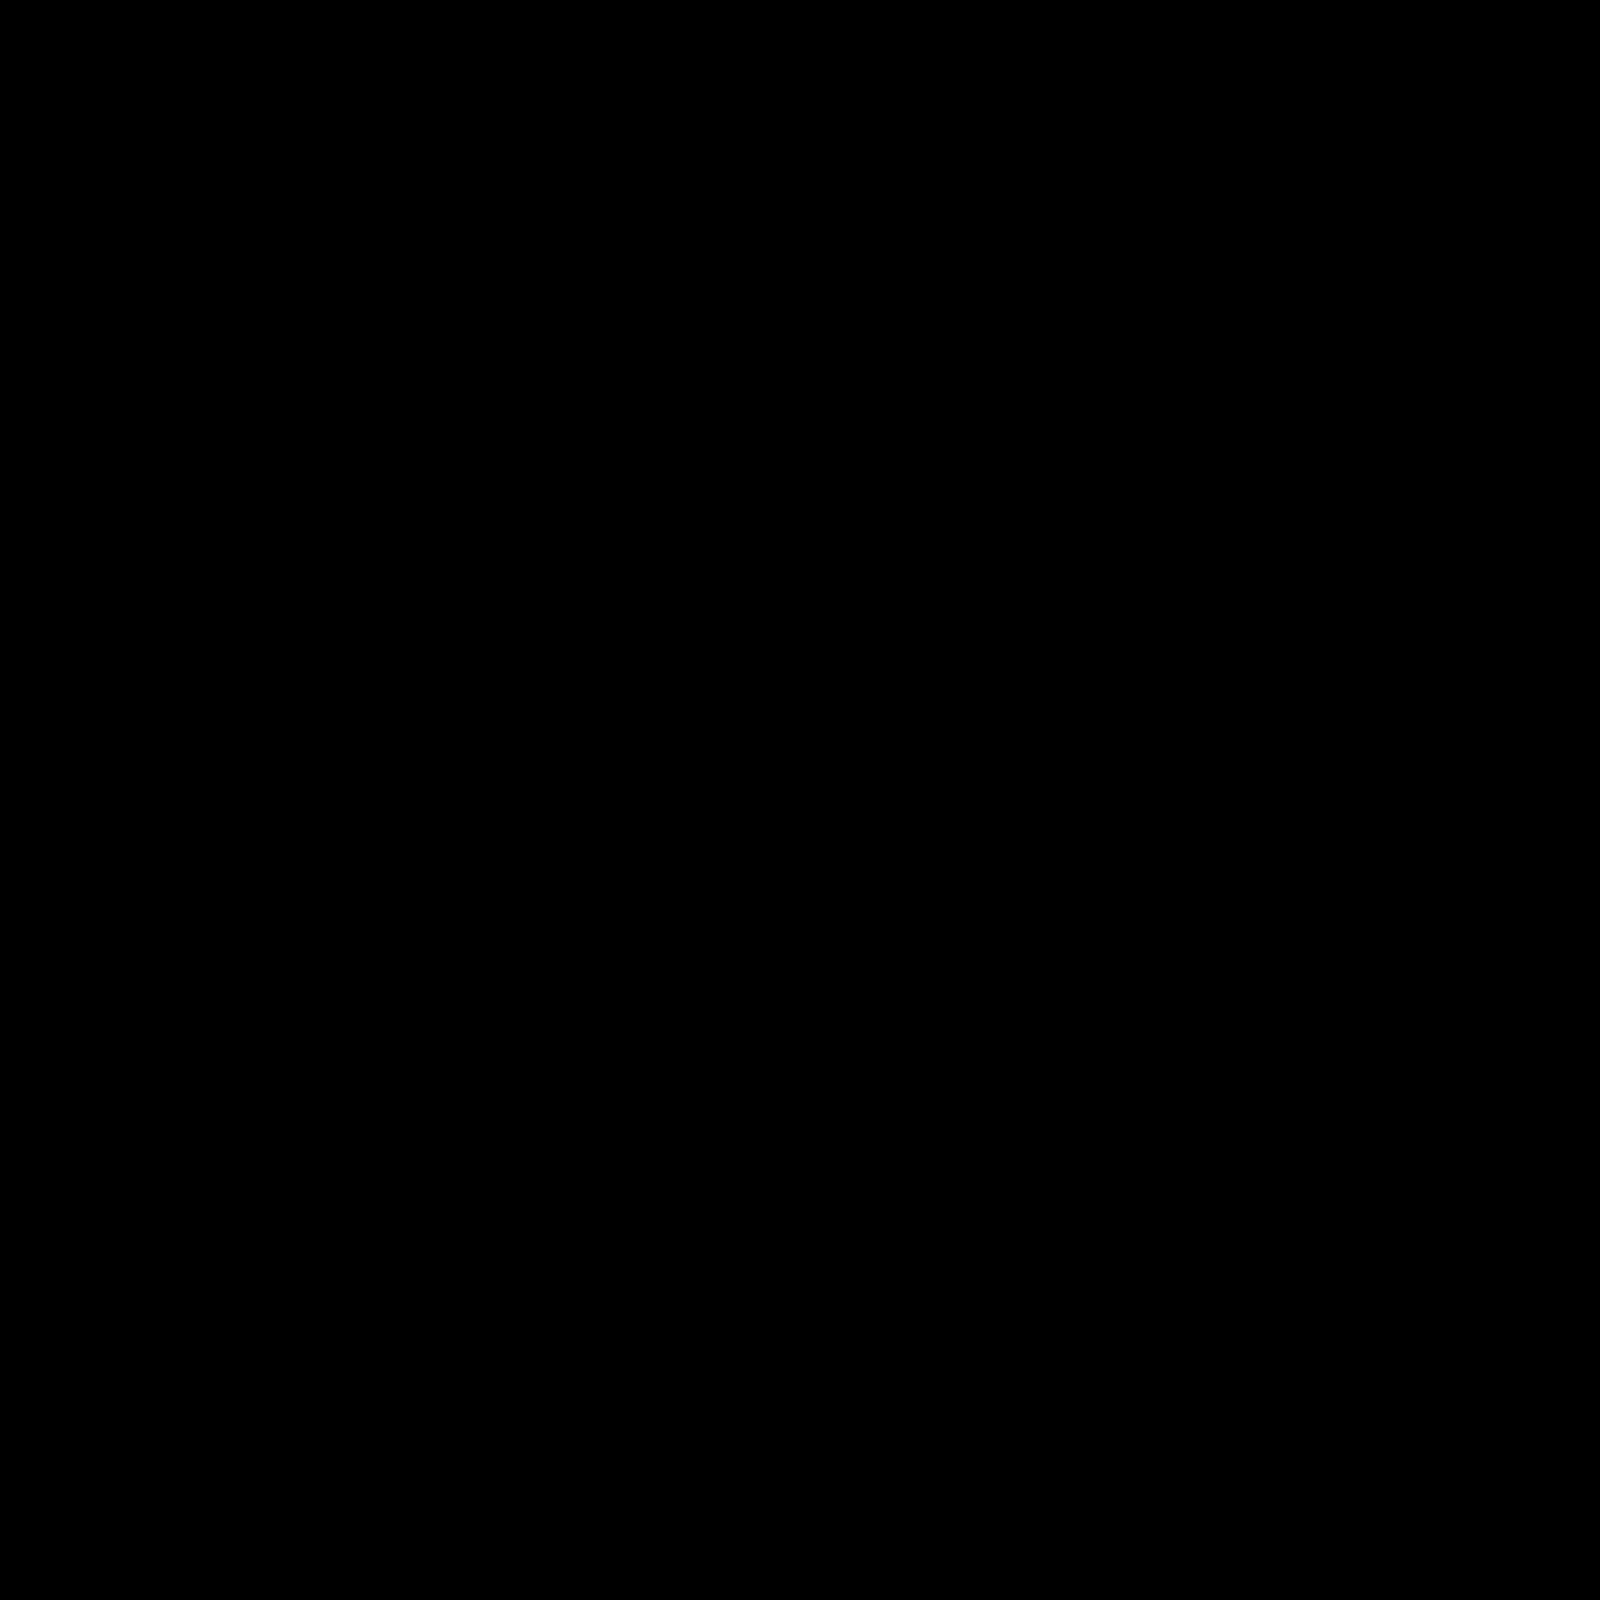 pencil icon png - 980×980